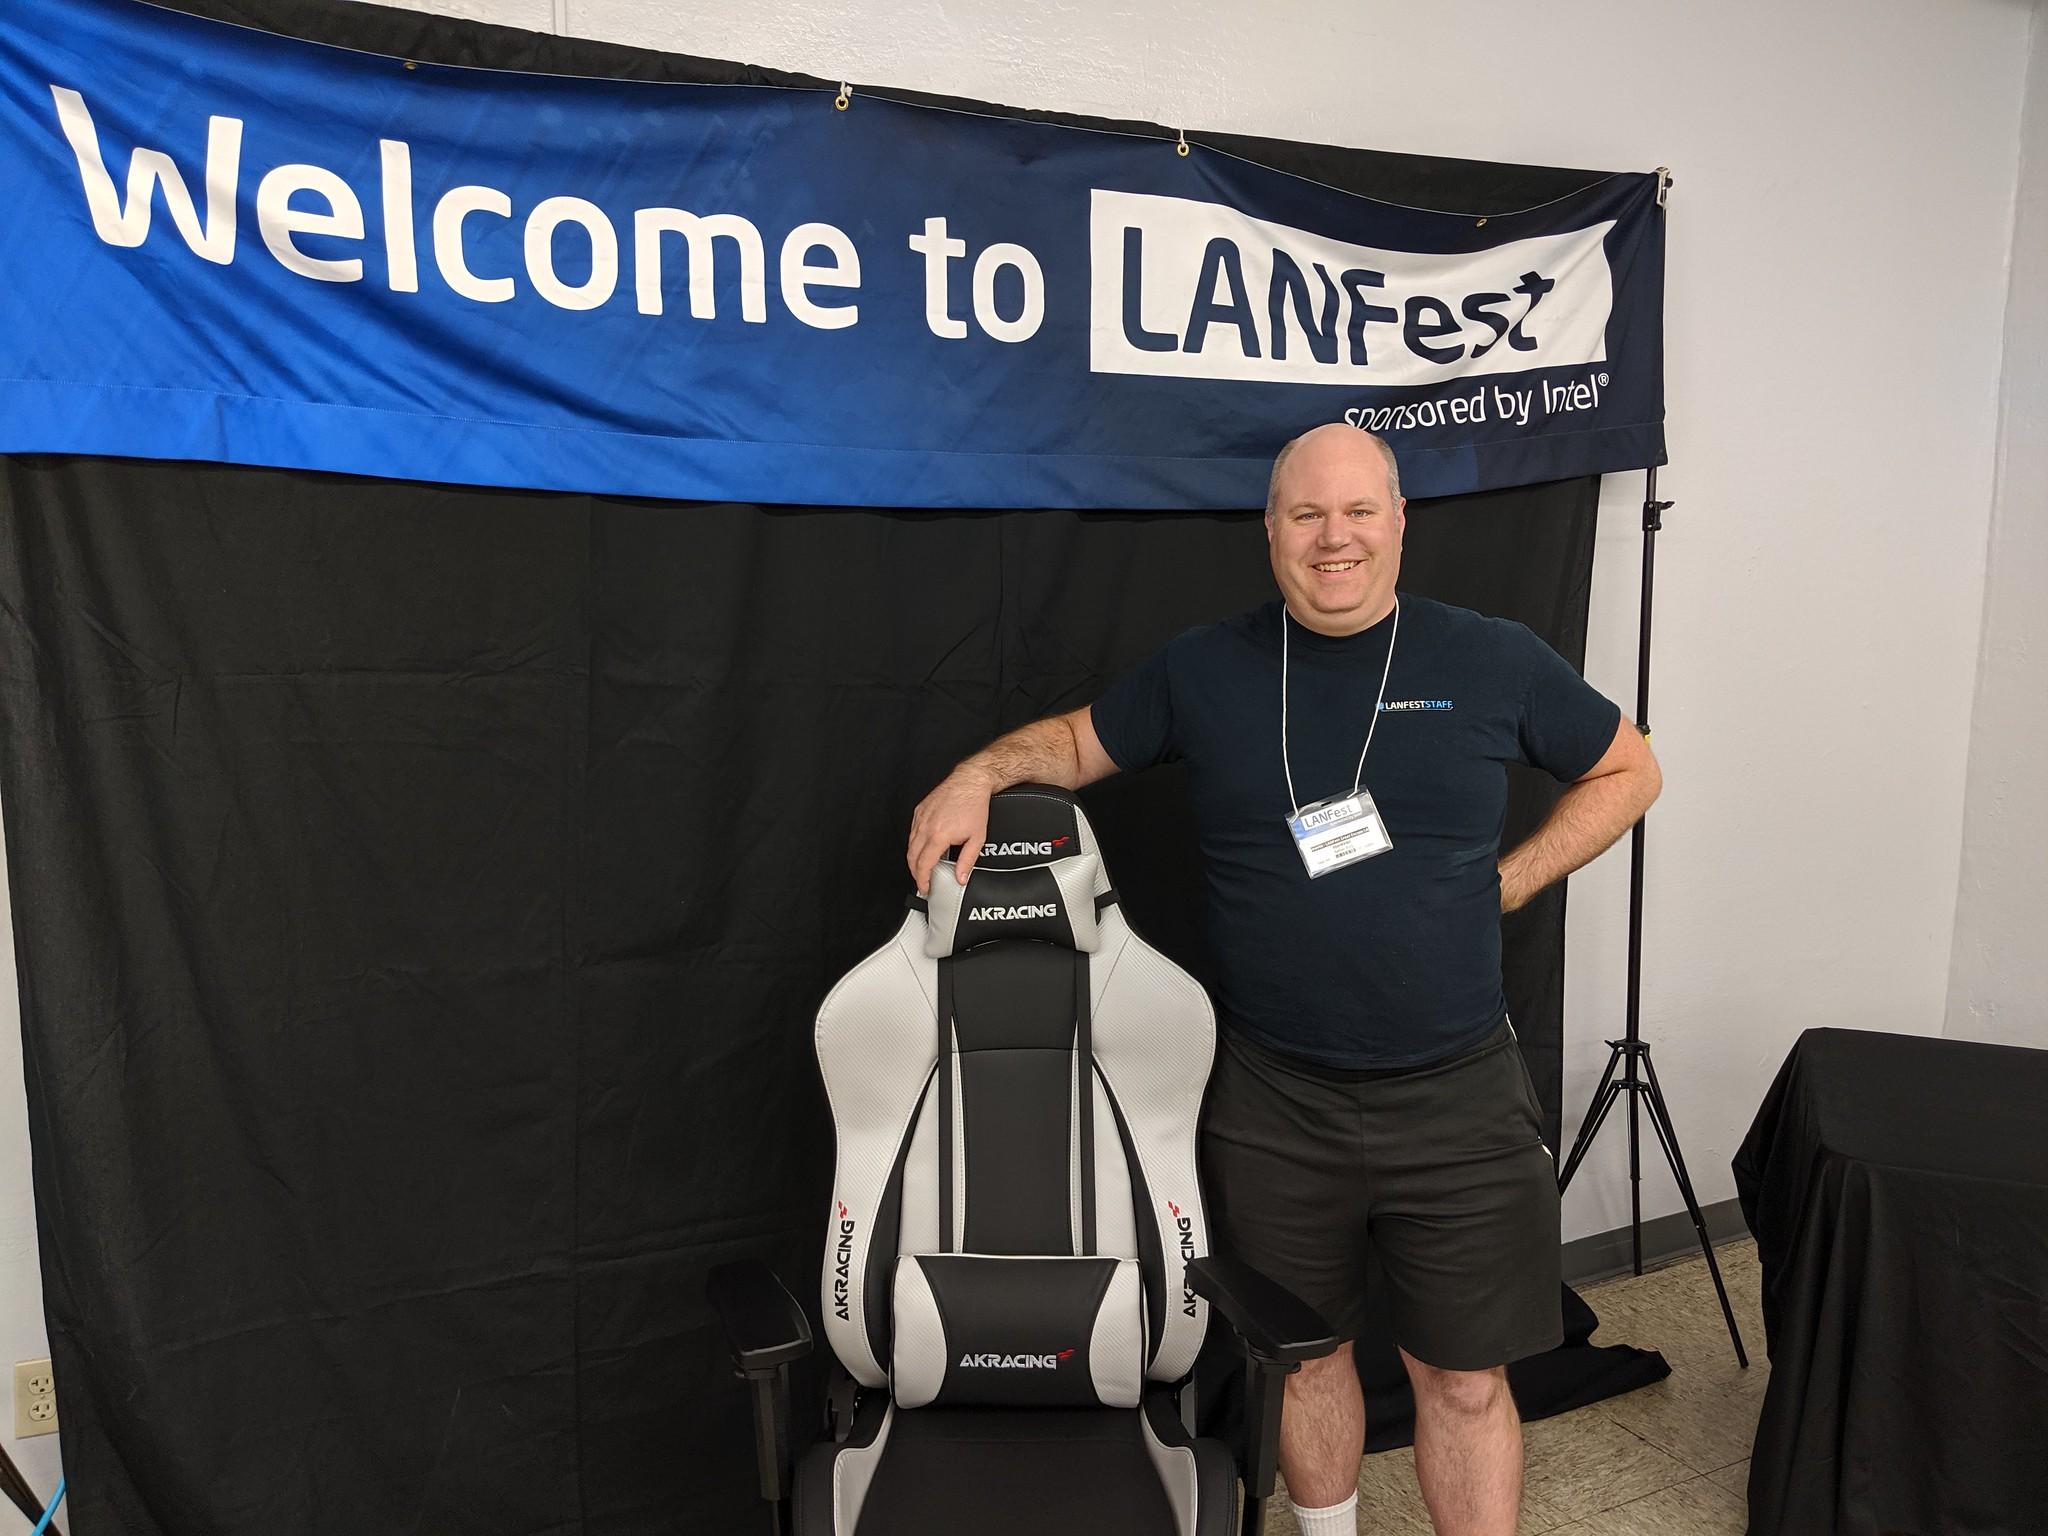 GEL 9 LANFest akracing